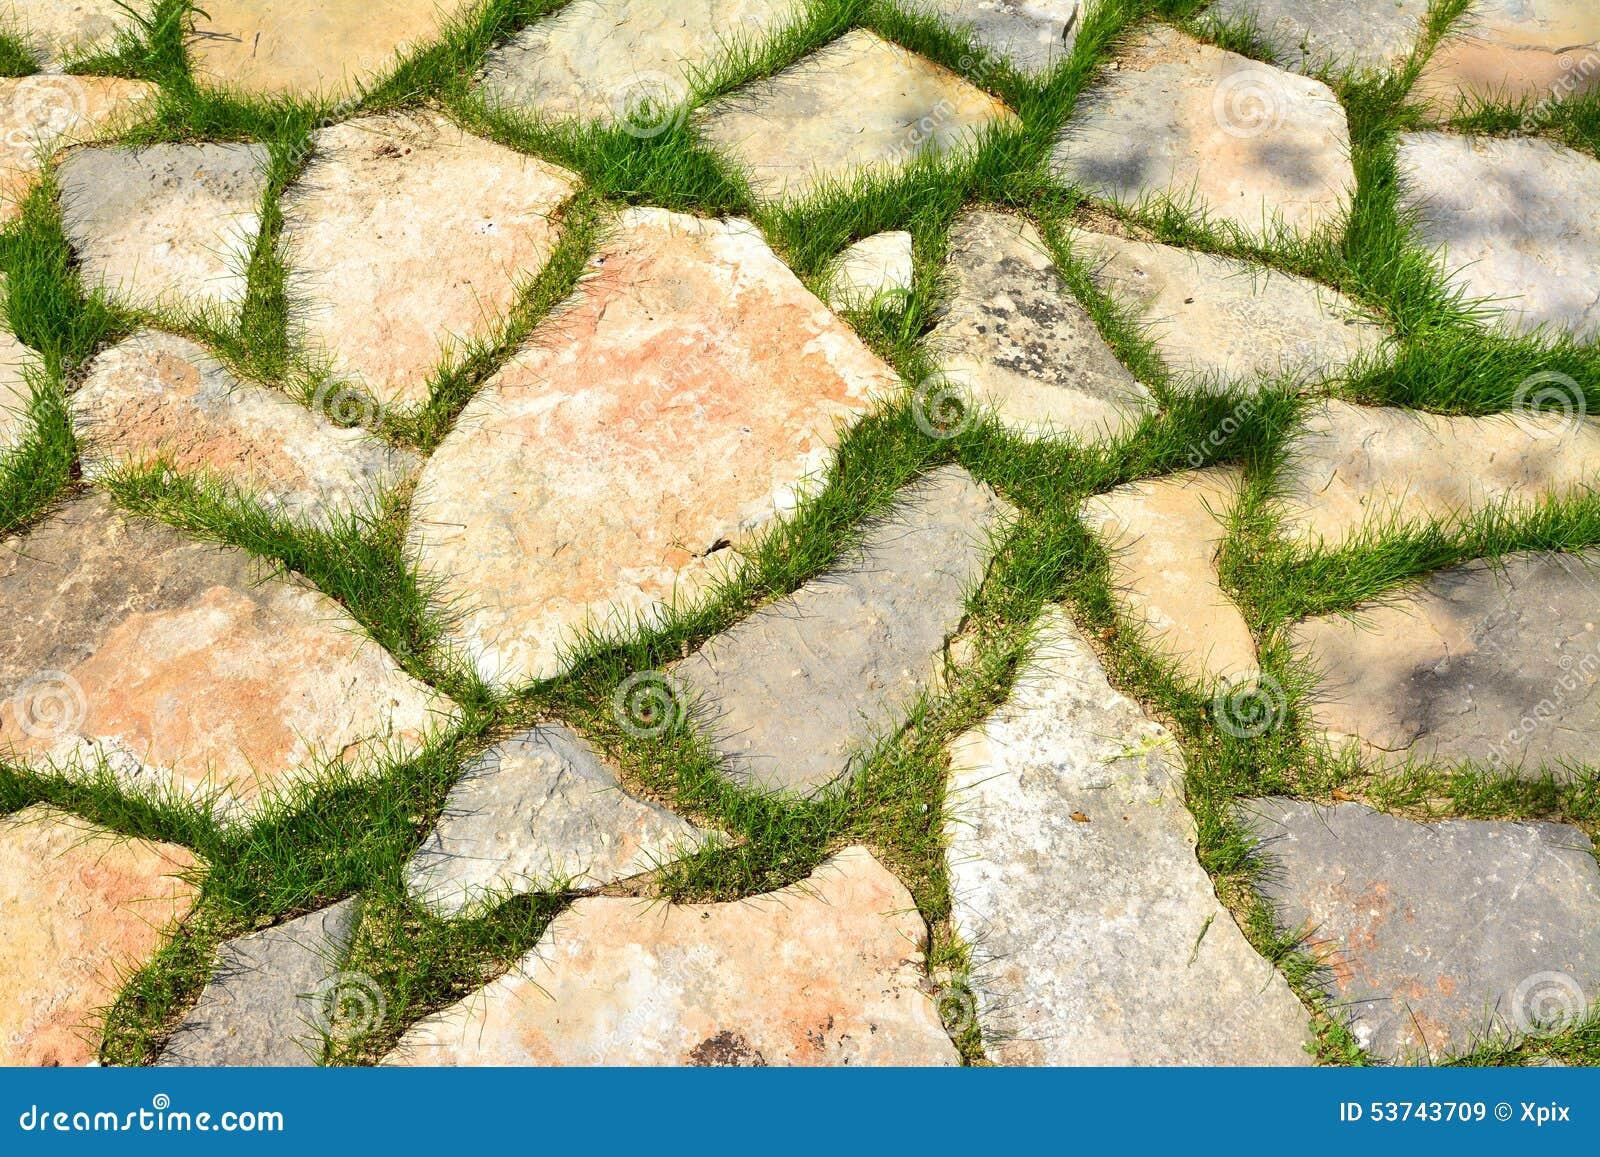 Stone Path In Green Grass Garden Pattern Stock Image